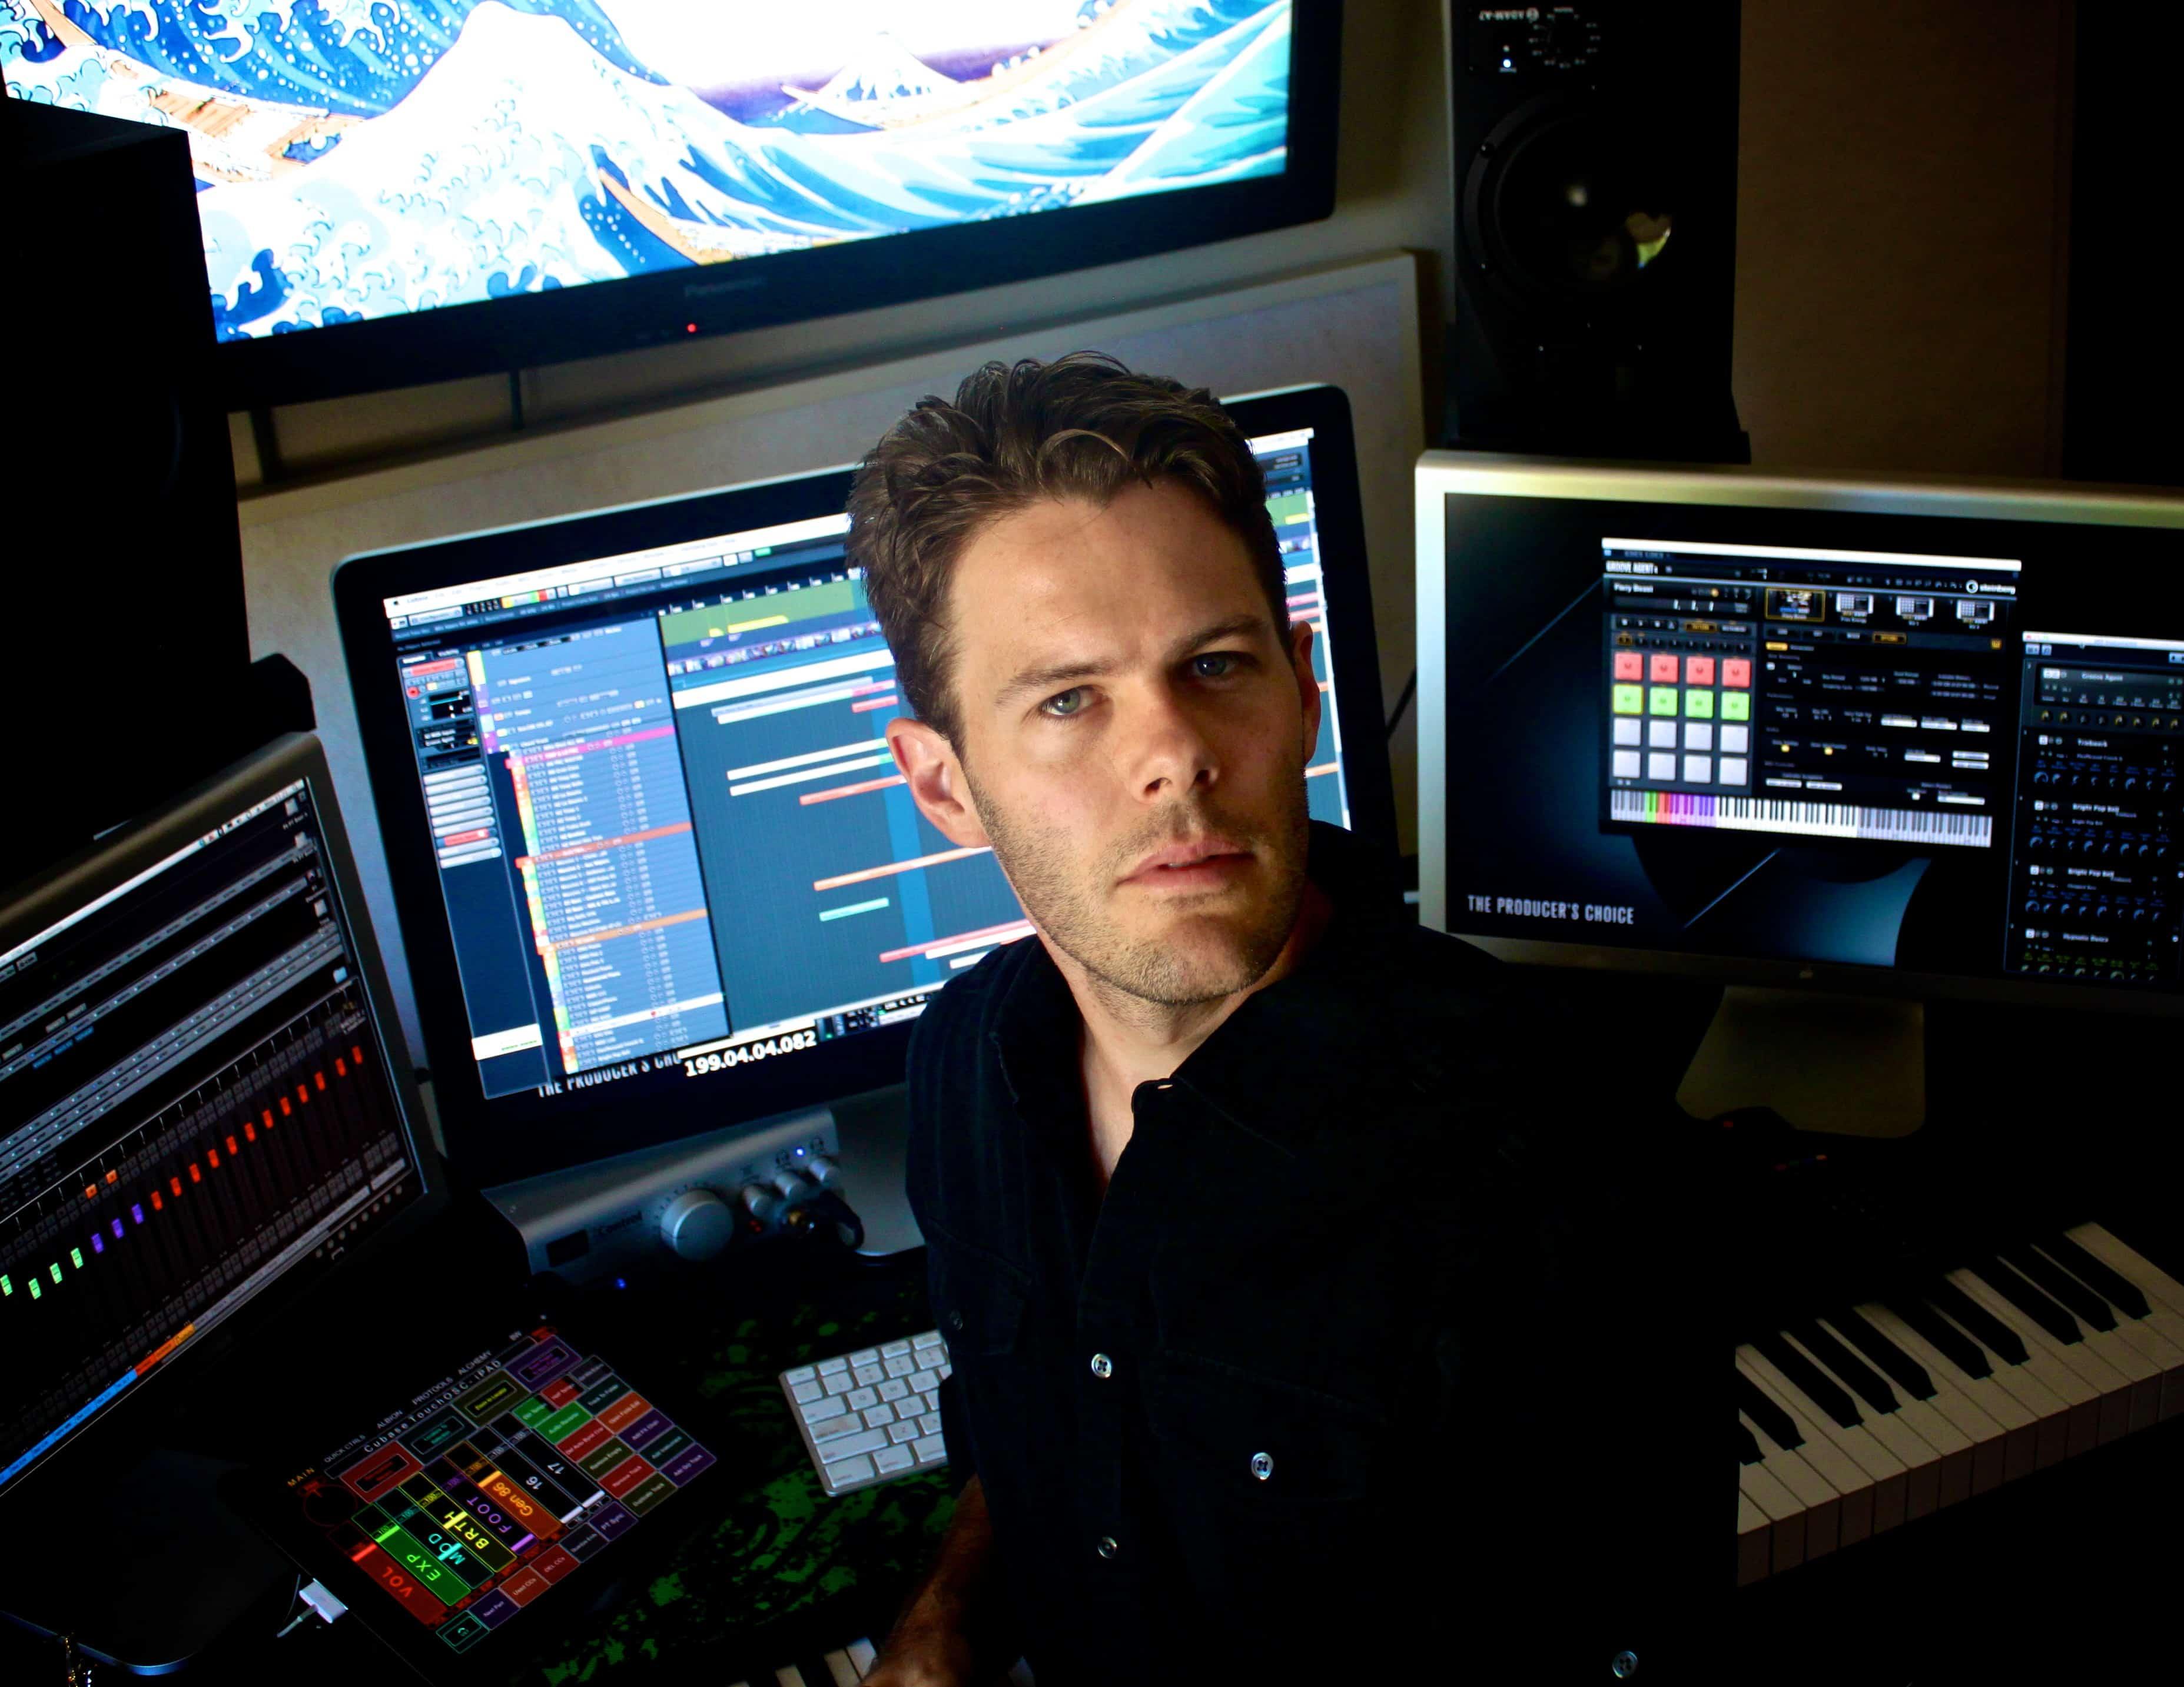 Composer Pieter Schlosser transforms emotions into music.